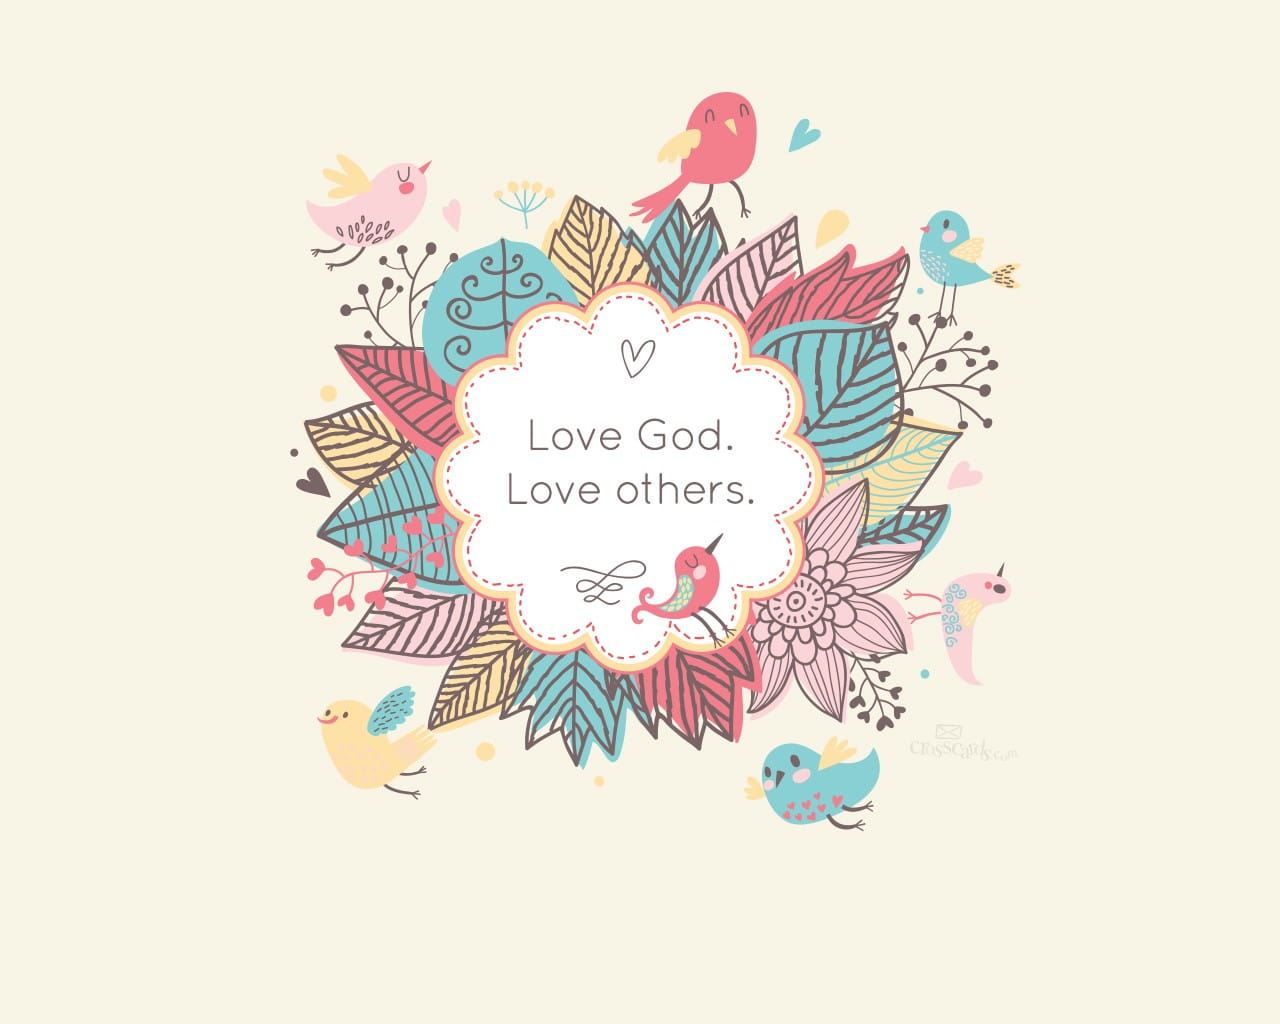 Beautiful Wallpaper Love God - 23659-love-god-love-others-1280-x-1024  Picture_41416.jpg